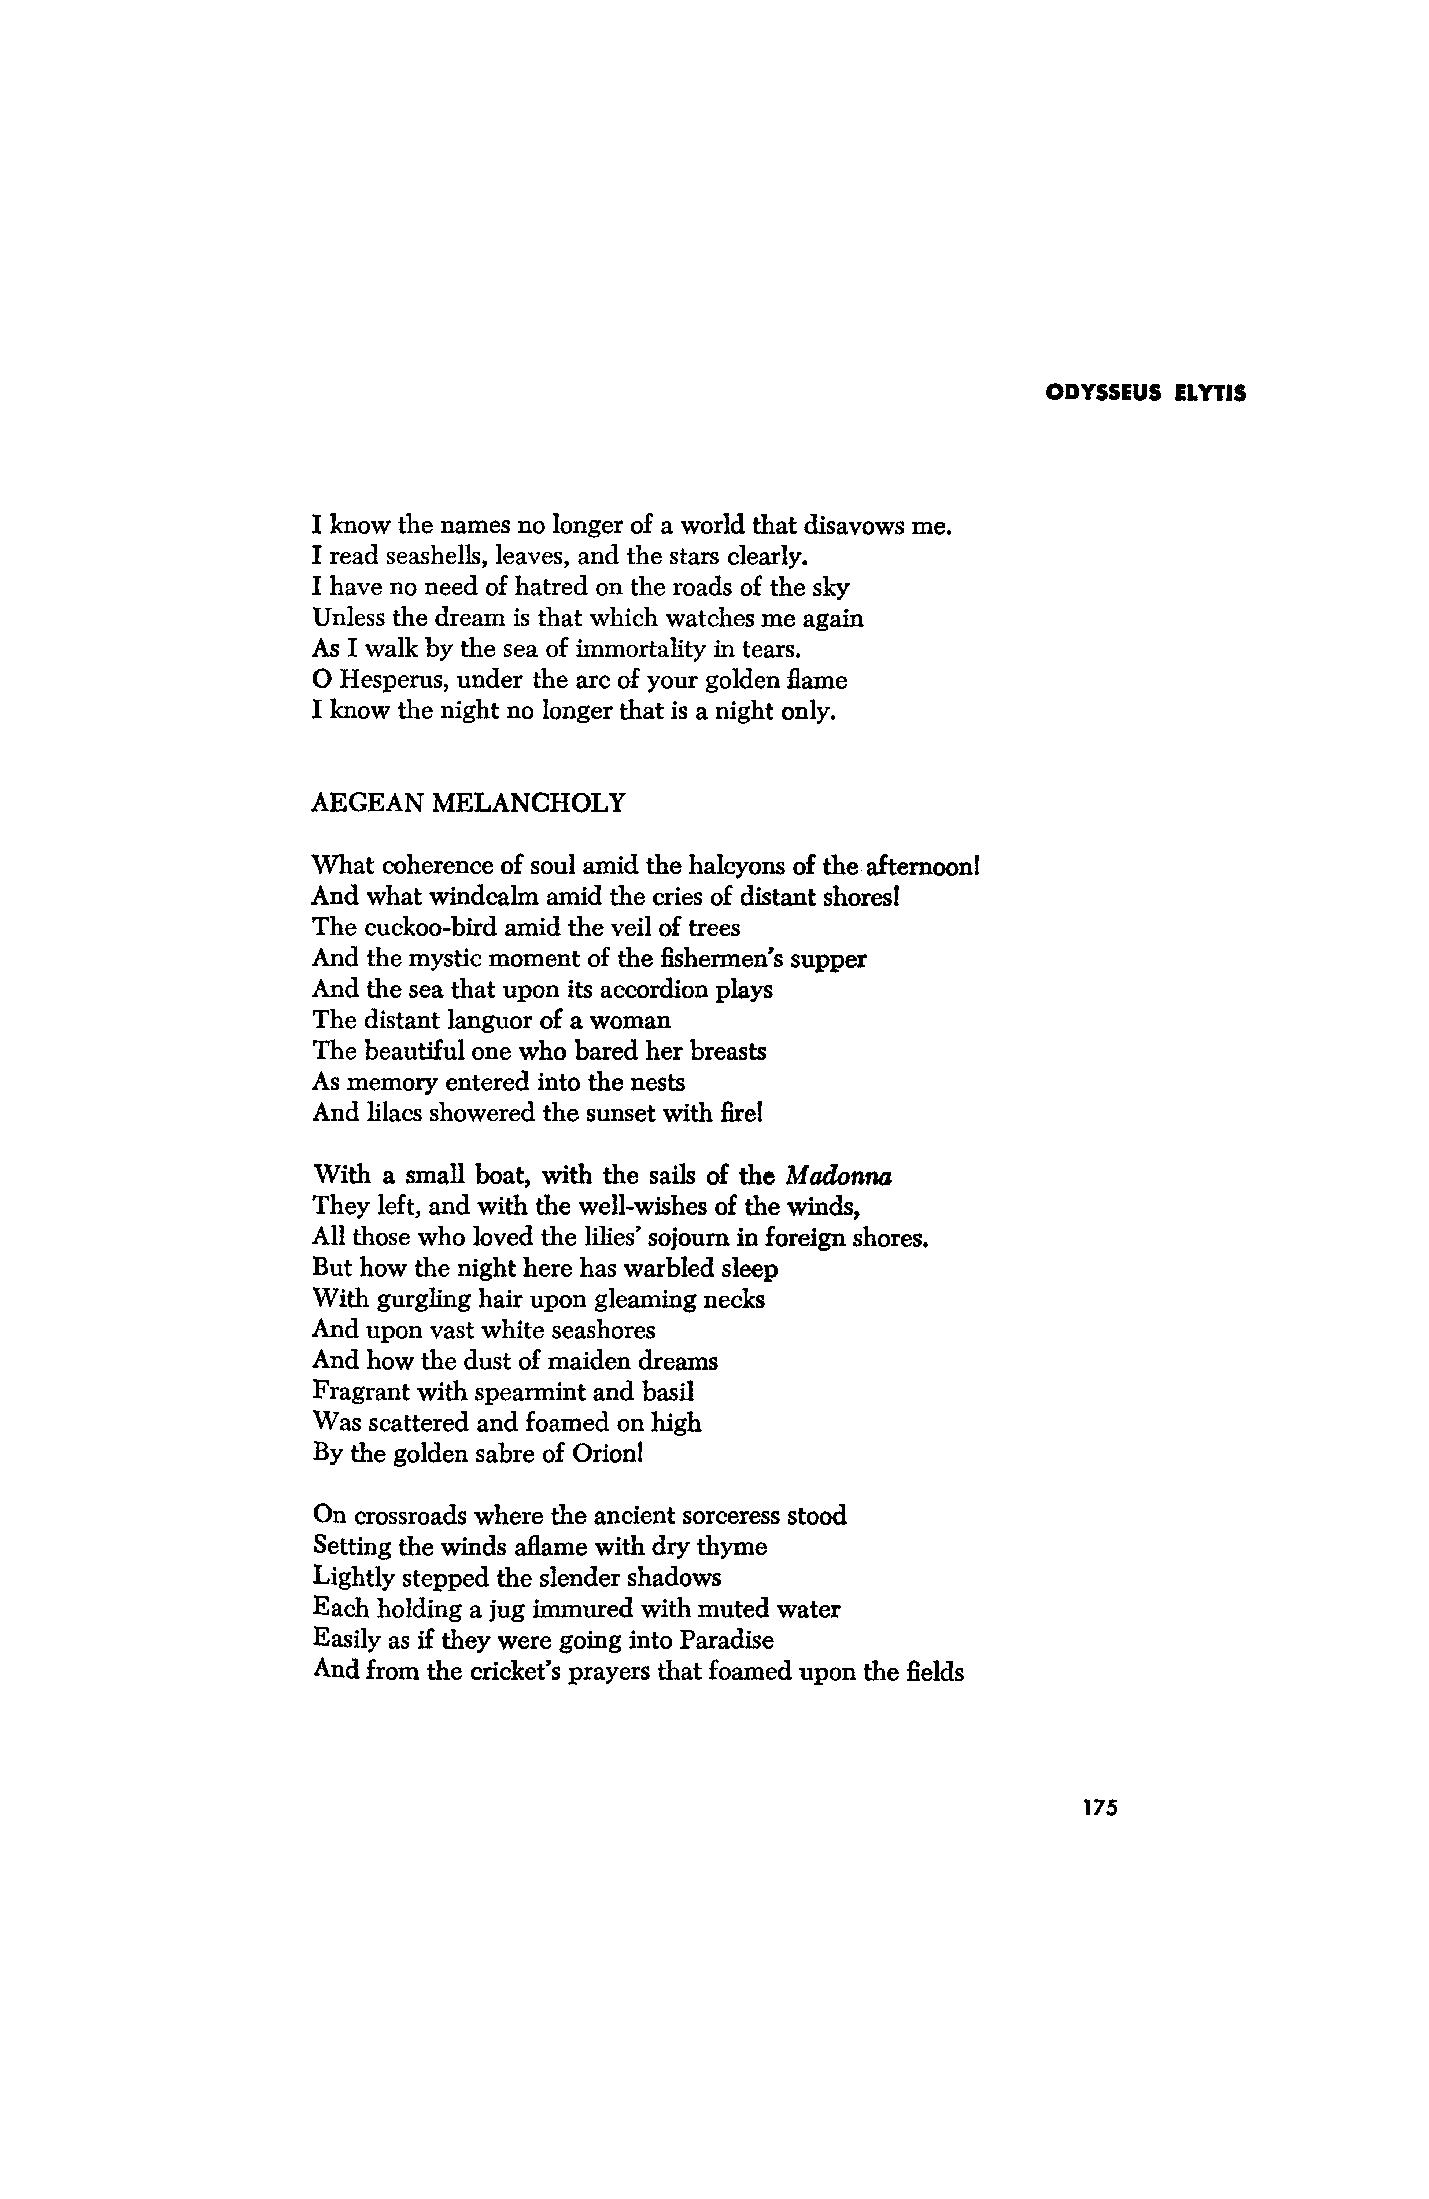 cent mille milliard poemes by raymond queneau a hundred billion aegean melancholy odysseus elytis